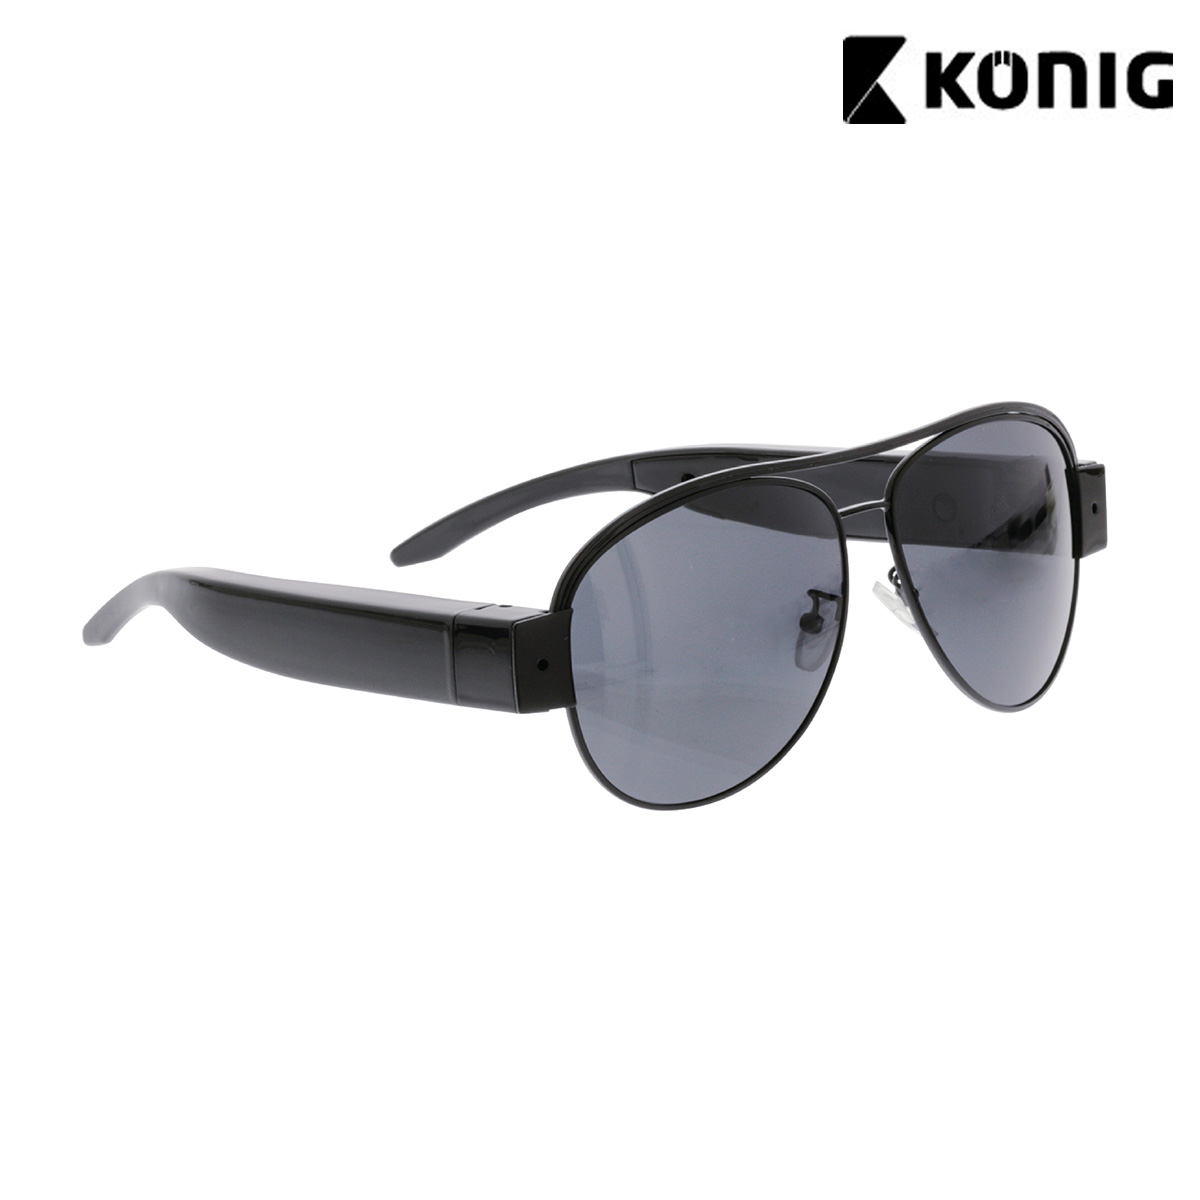 8d27b5fed9 Gafas de sol con camara espia Full HD > el rincon del espia > seguridad